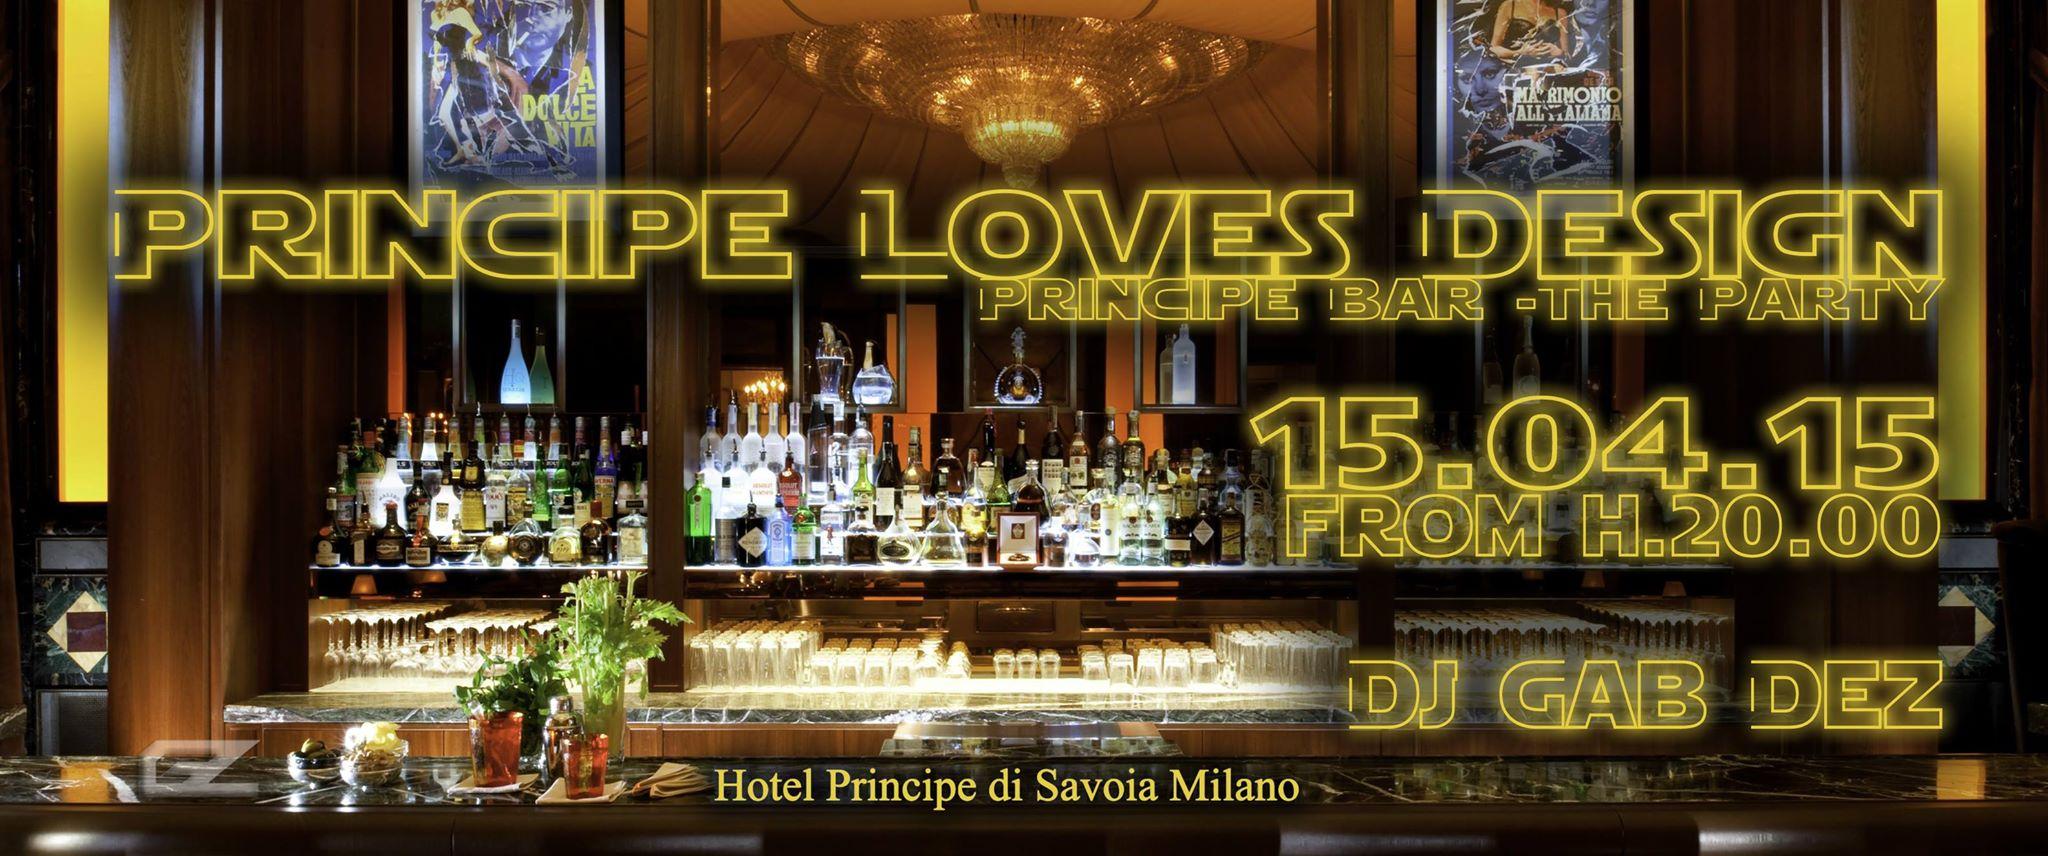 Principe Loves Design